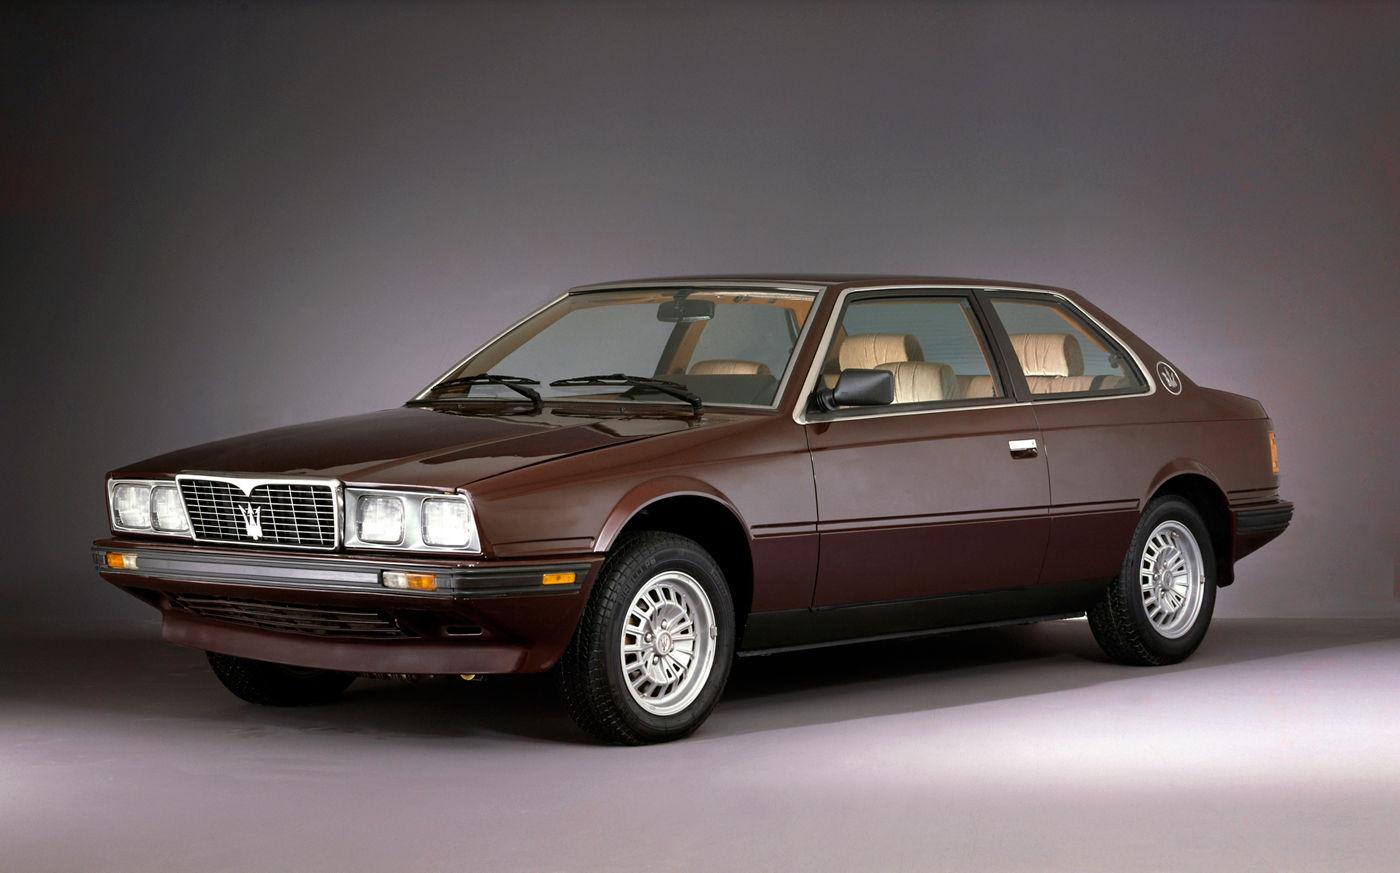 Maserati Classic - Biturbo - carrosserie marron - vue latérale